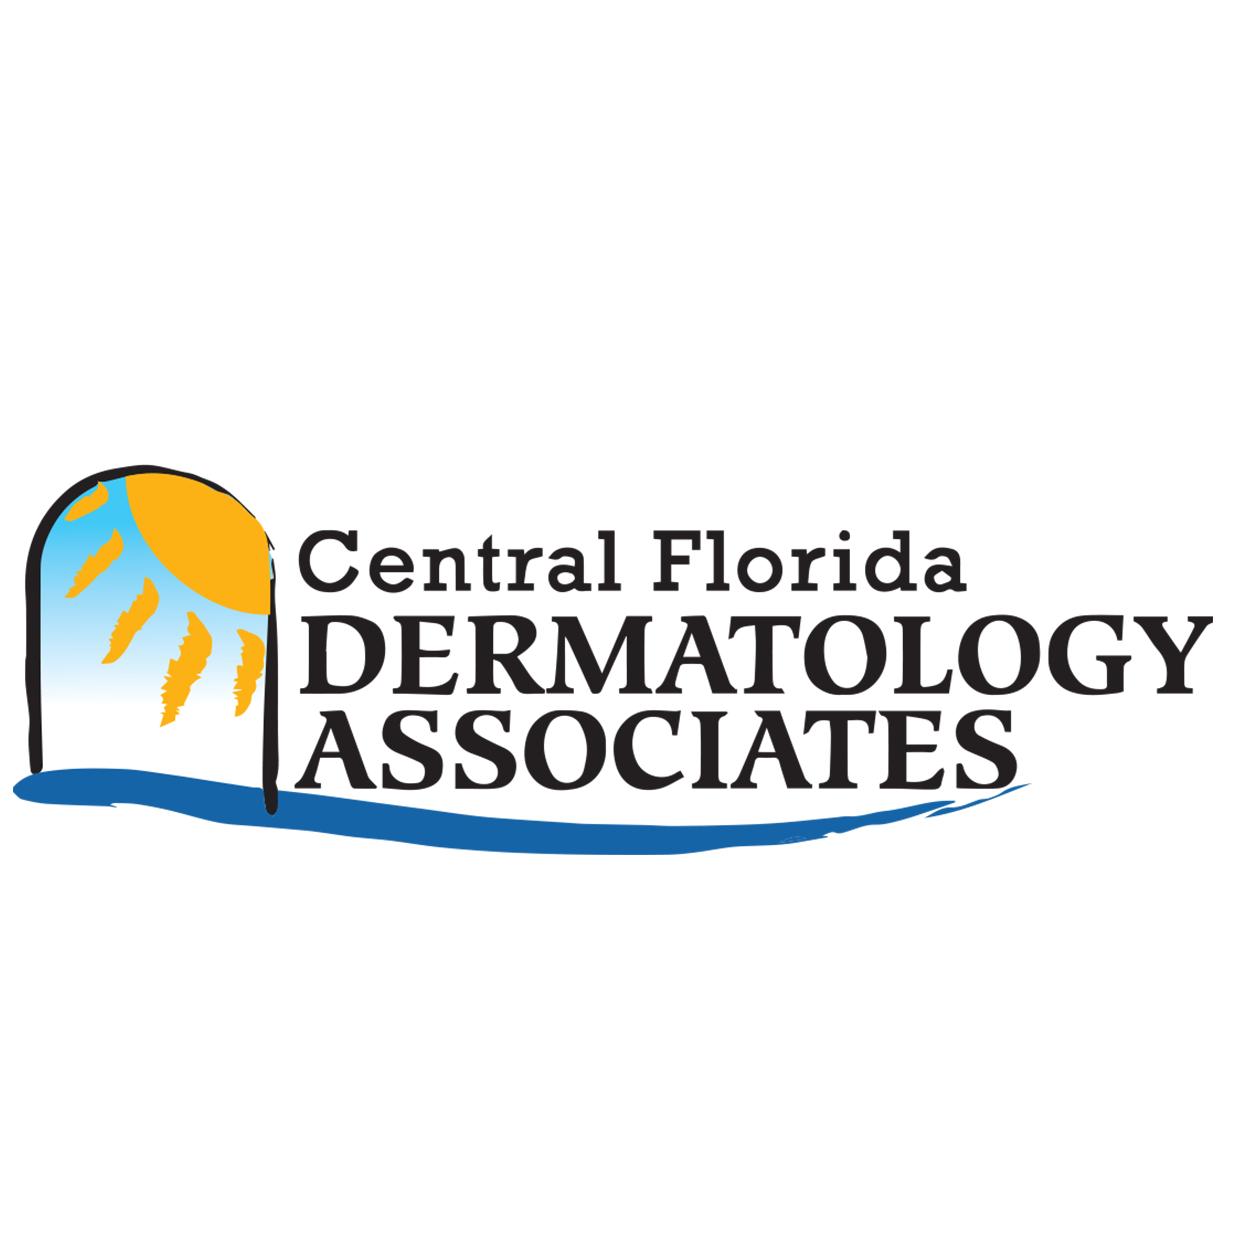 Central Florida Dermatology